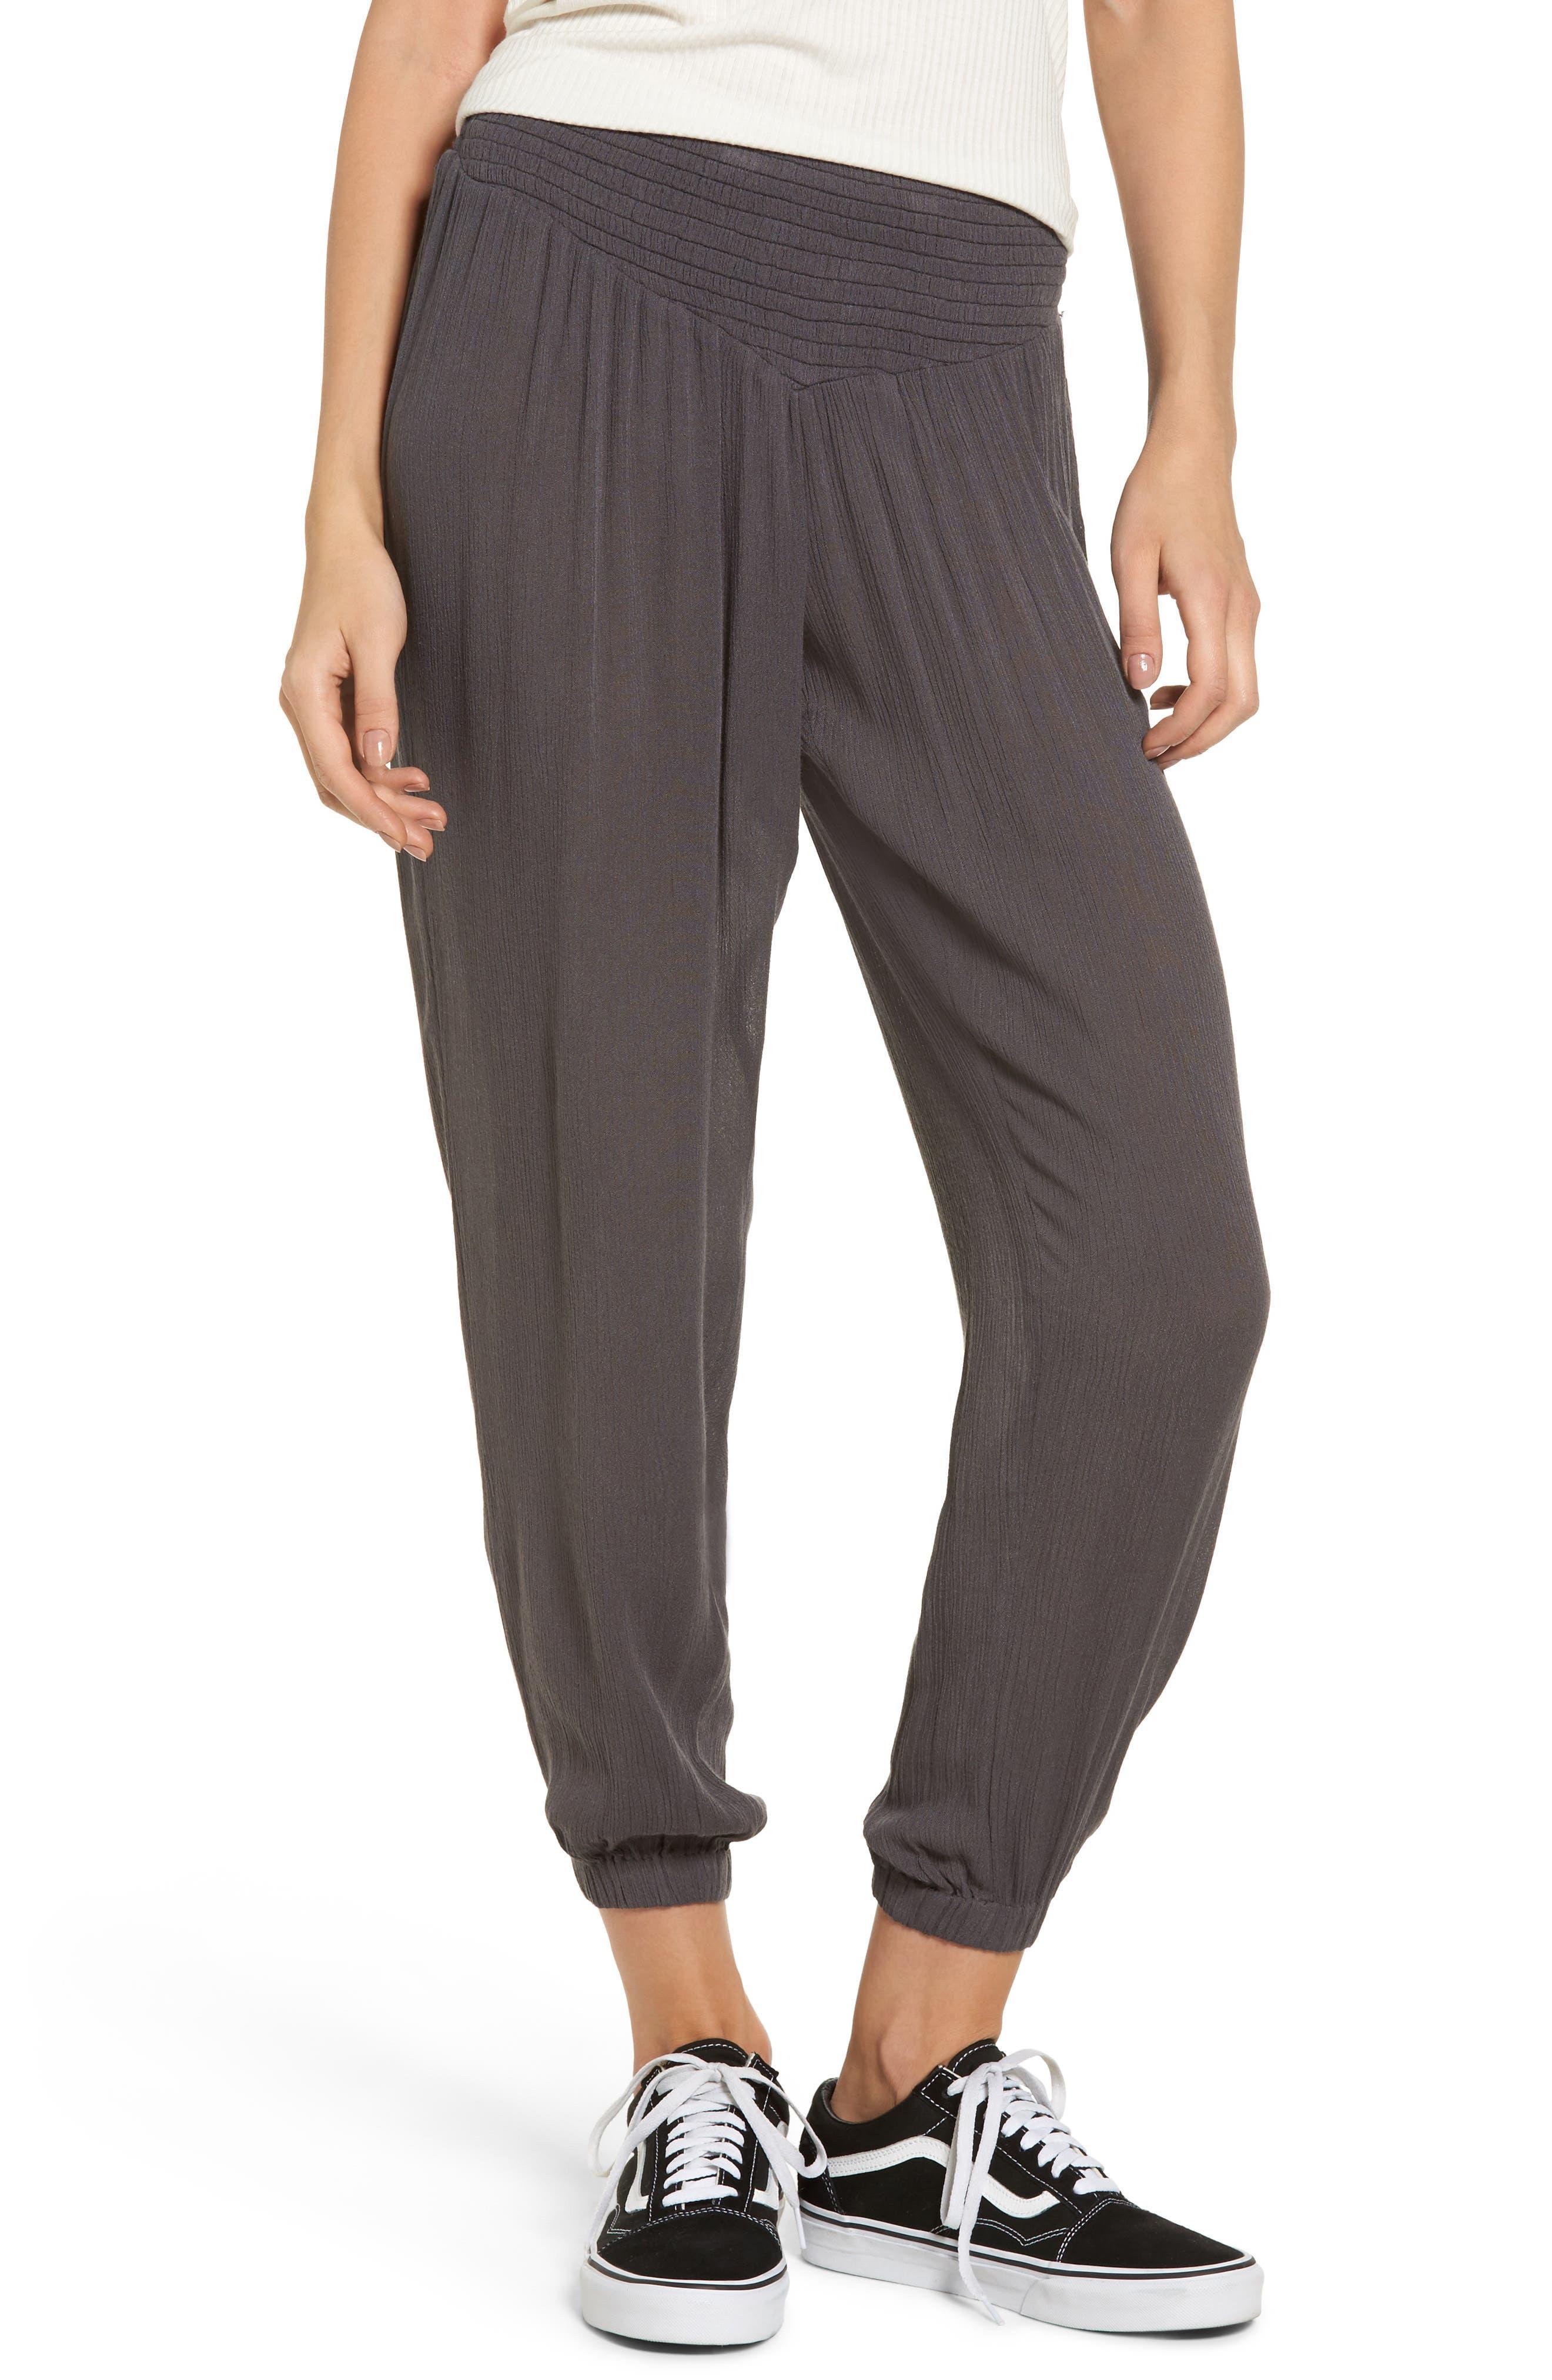 South Shore Pants,                         Main,                         color, Charcoal